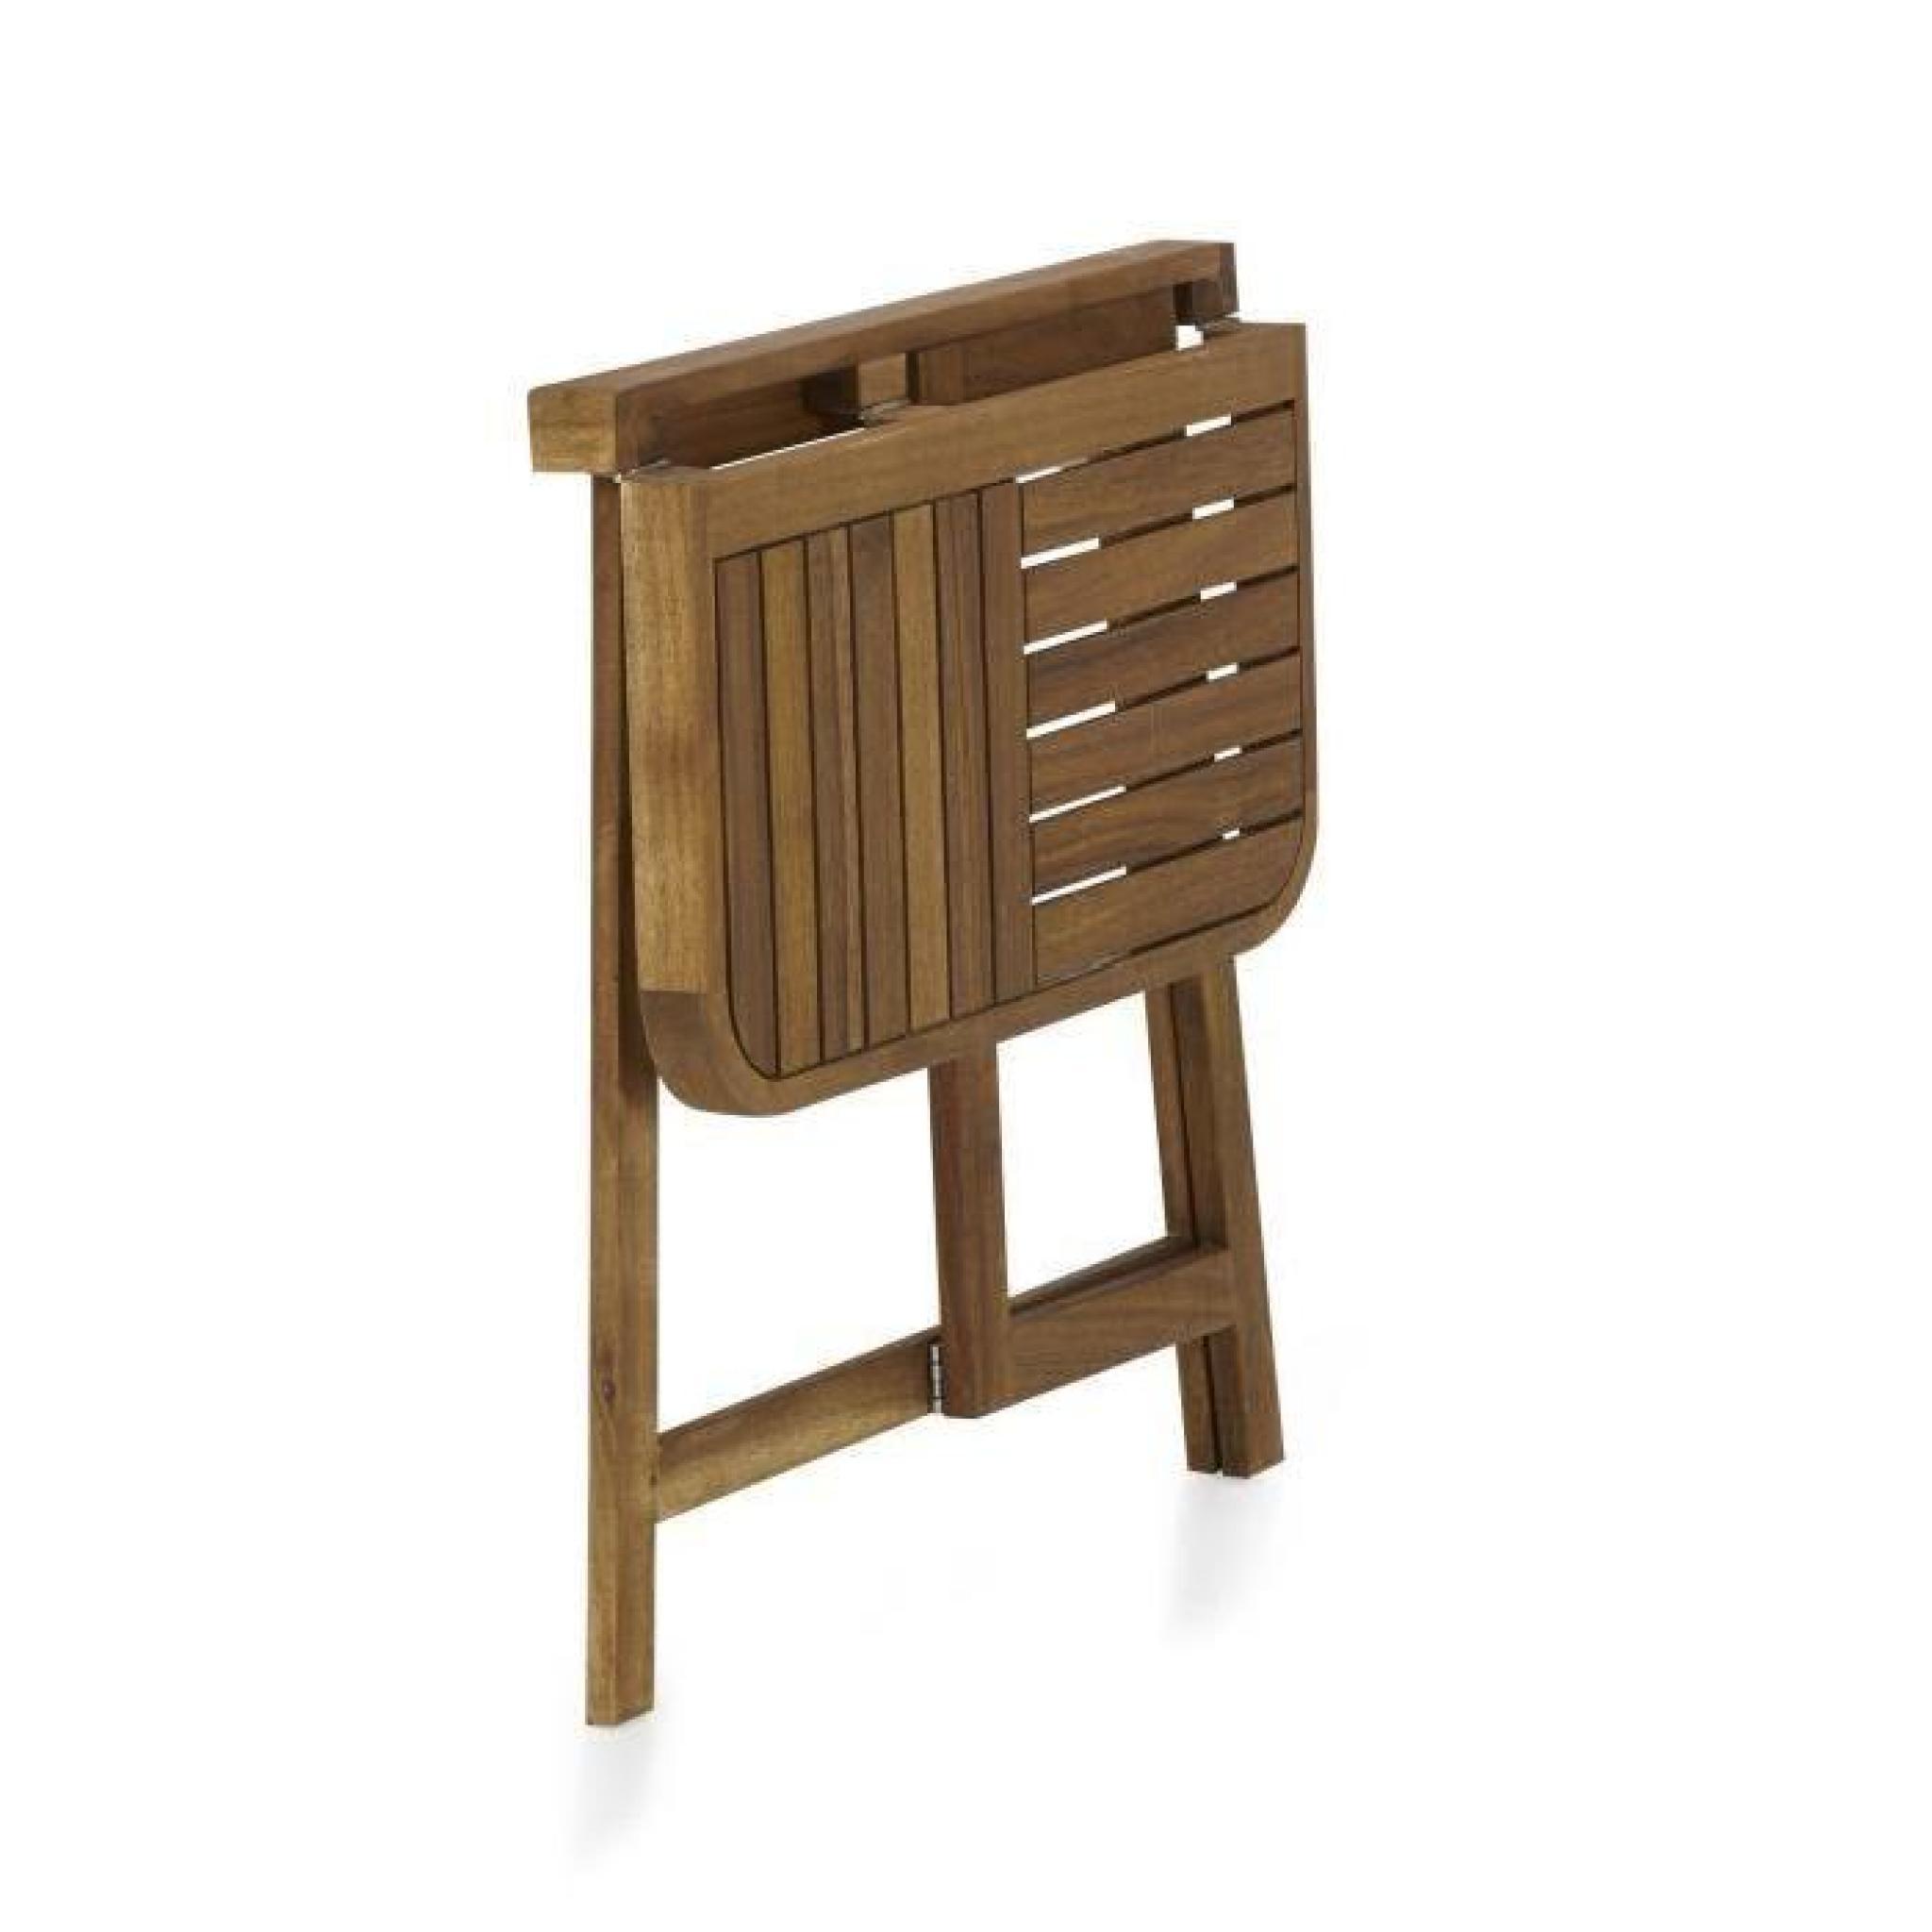 youk demi table pliante pour balcon acacia huil achat. Black Bedroom Furniture Sets. Home Design Ideas